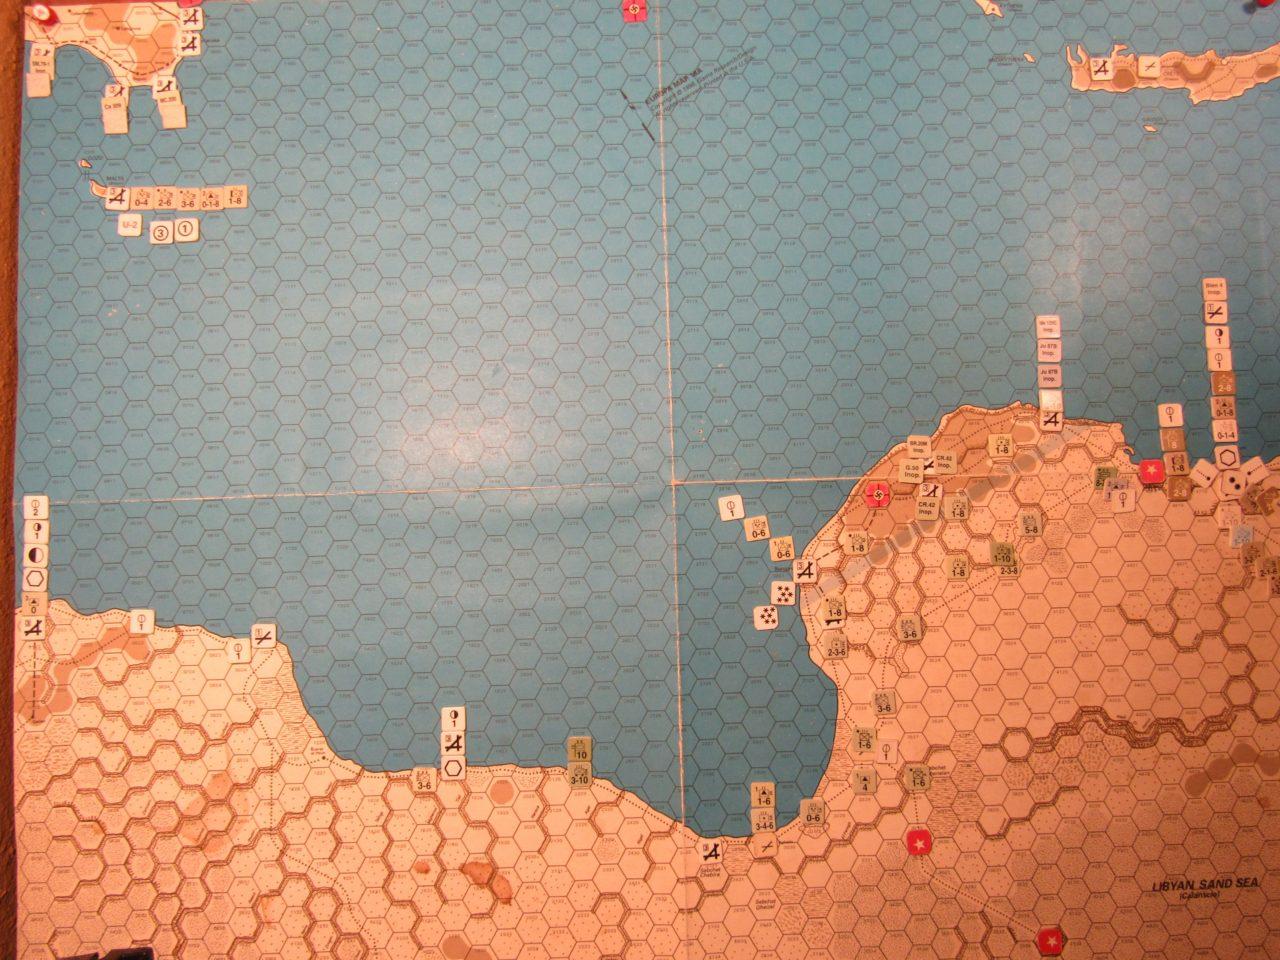 WW ME/ER-II/Crete Scenario Apr I 41 Axis EOT dispositions: Libya and Sicily